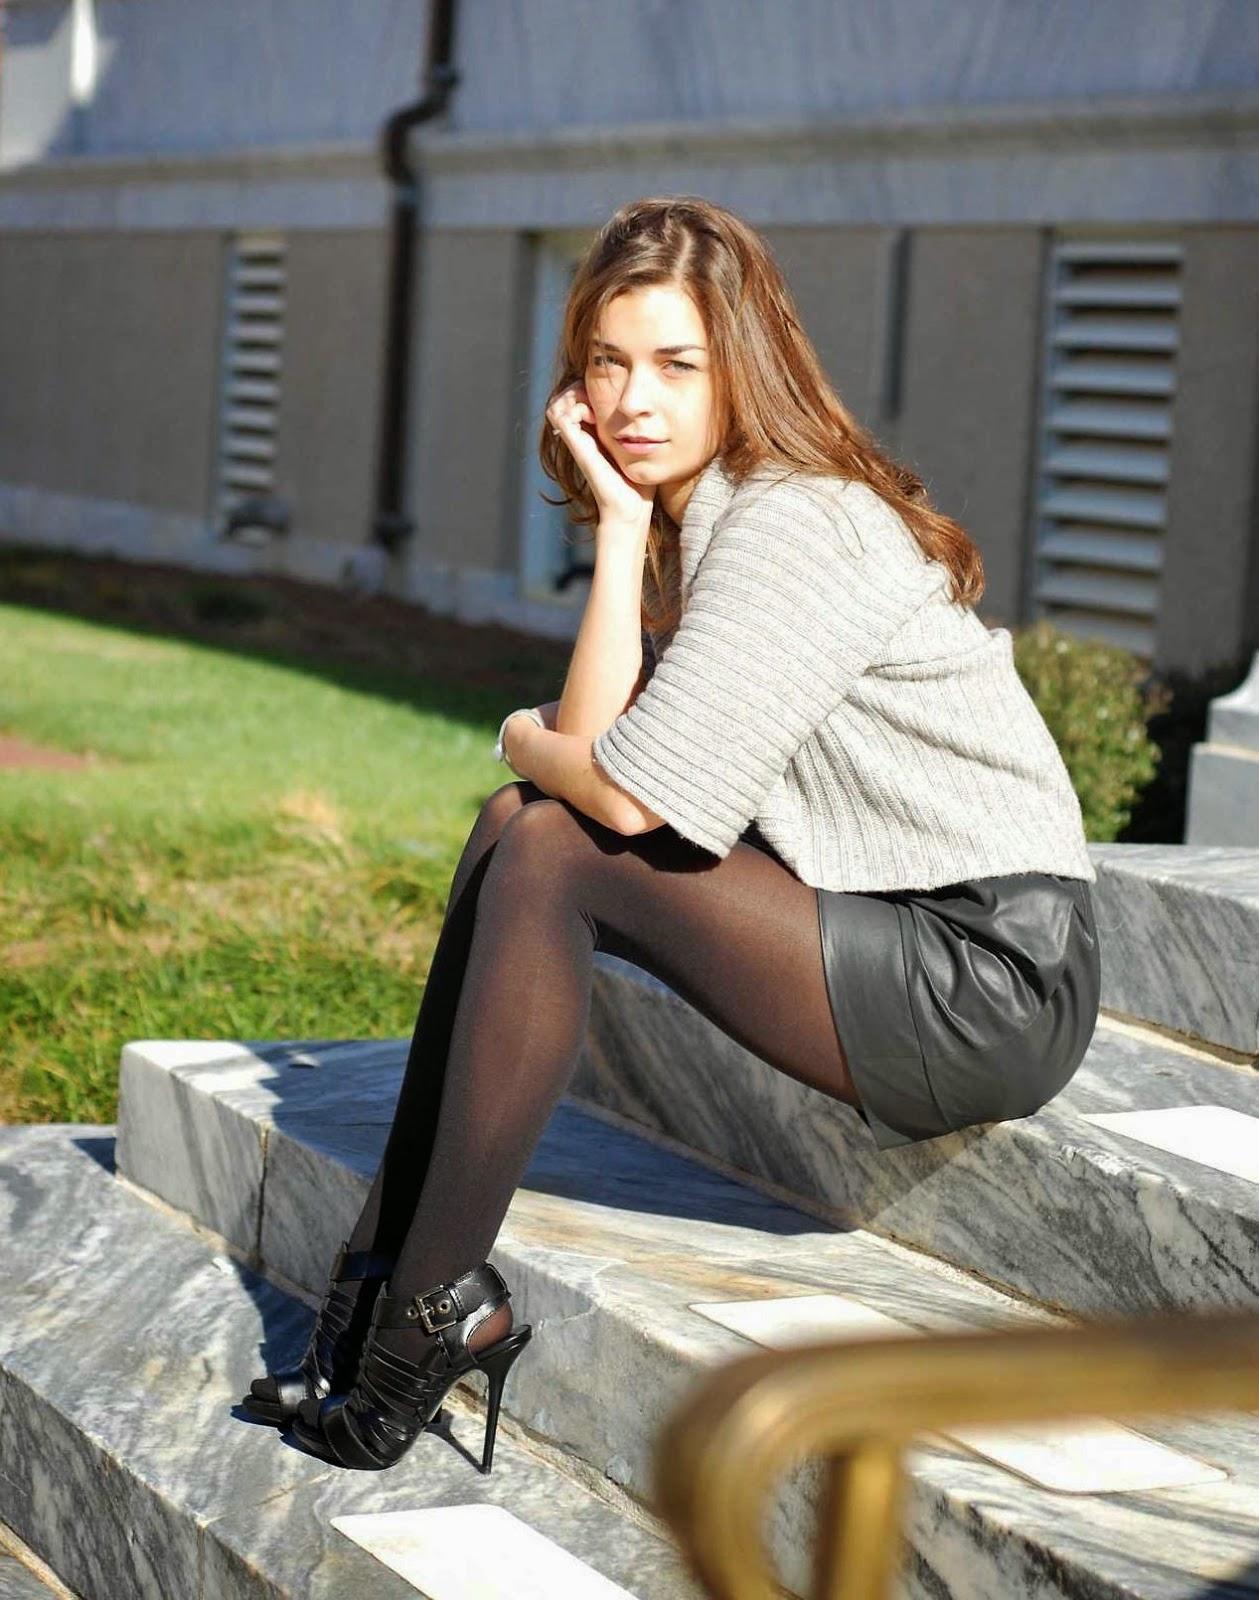 Nylon Stockings Teen Pantyhose Stories Pantyhose 94